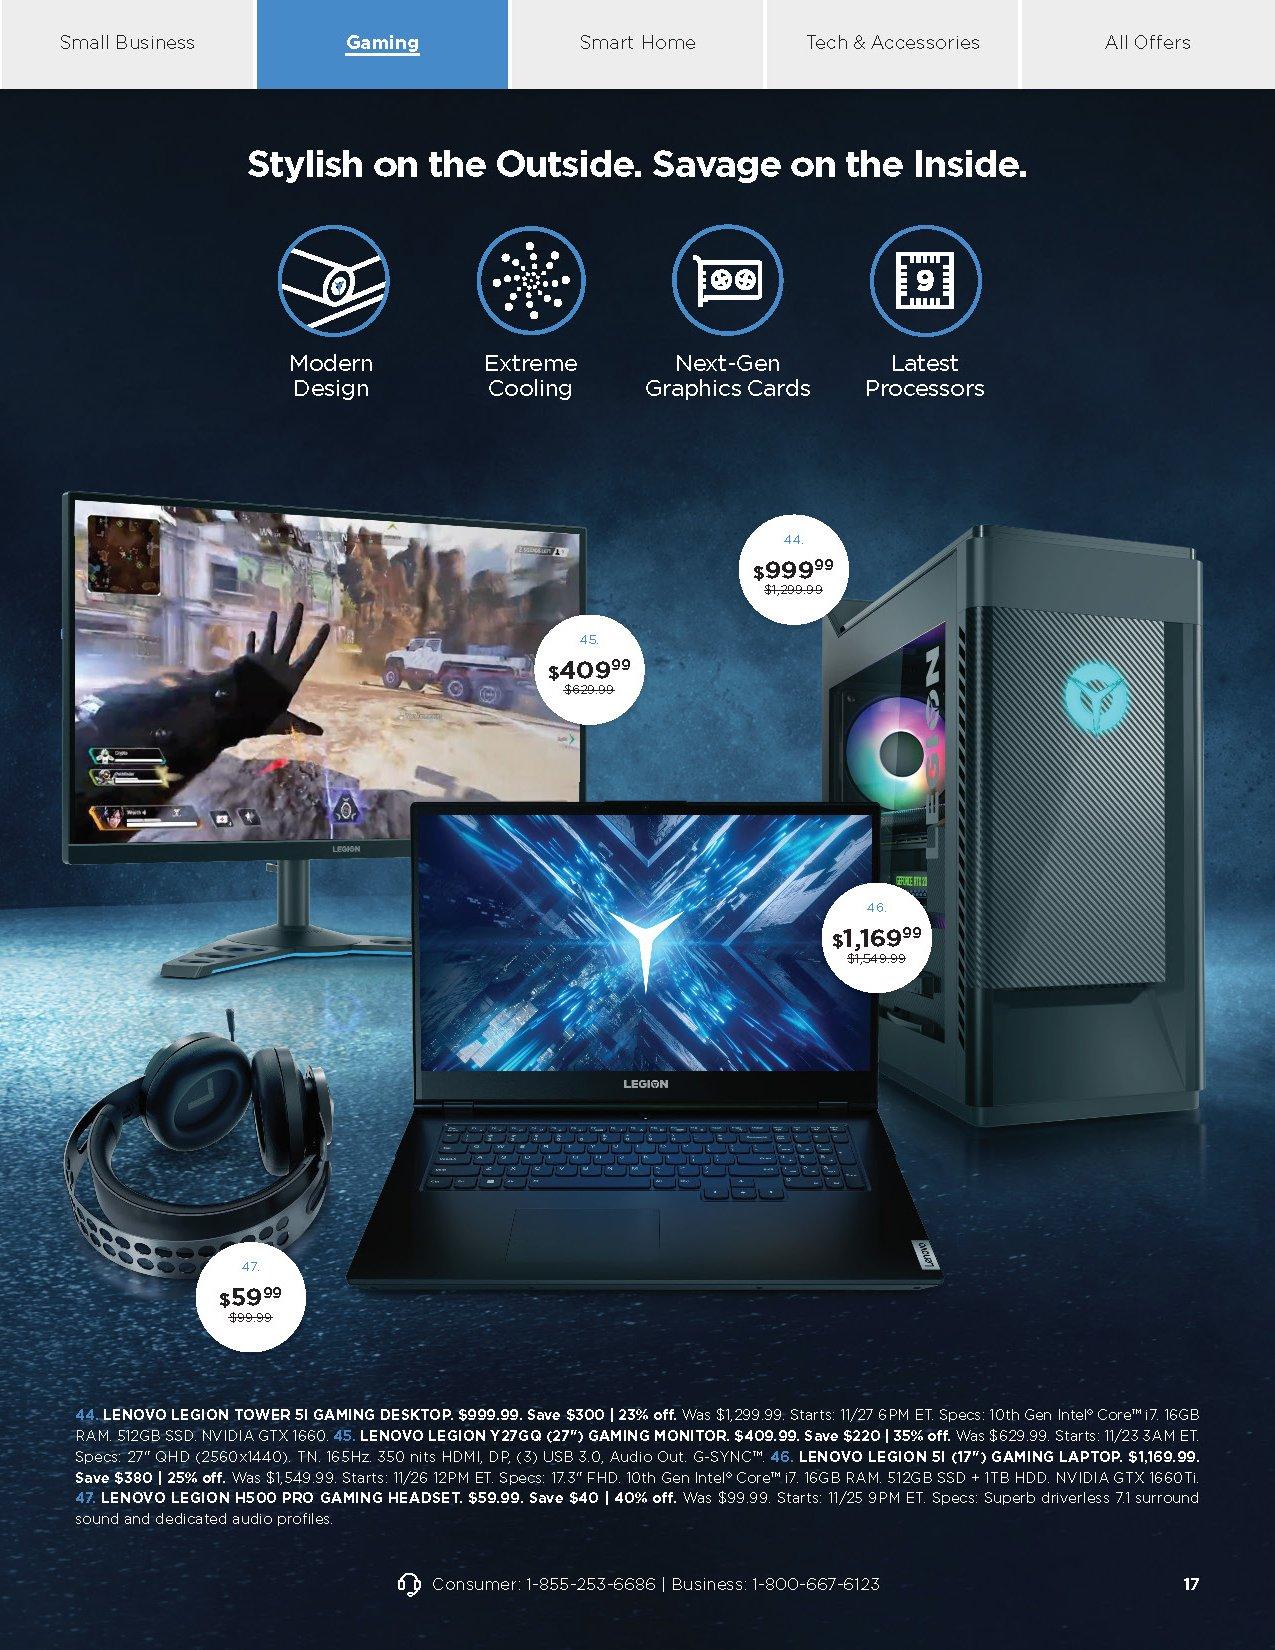 Lenovo Black Friday 2020 Page 14